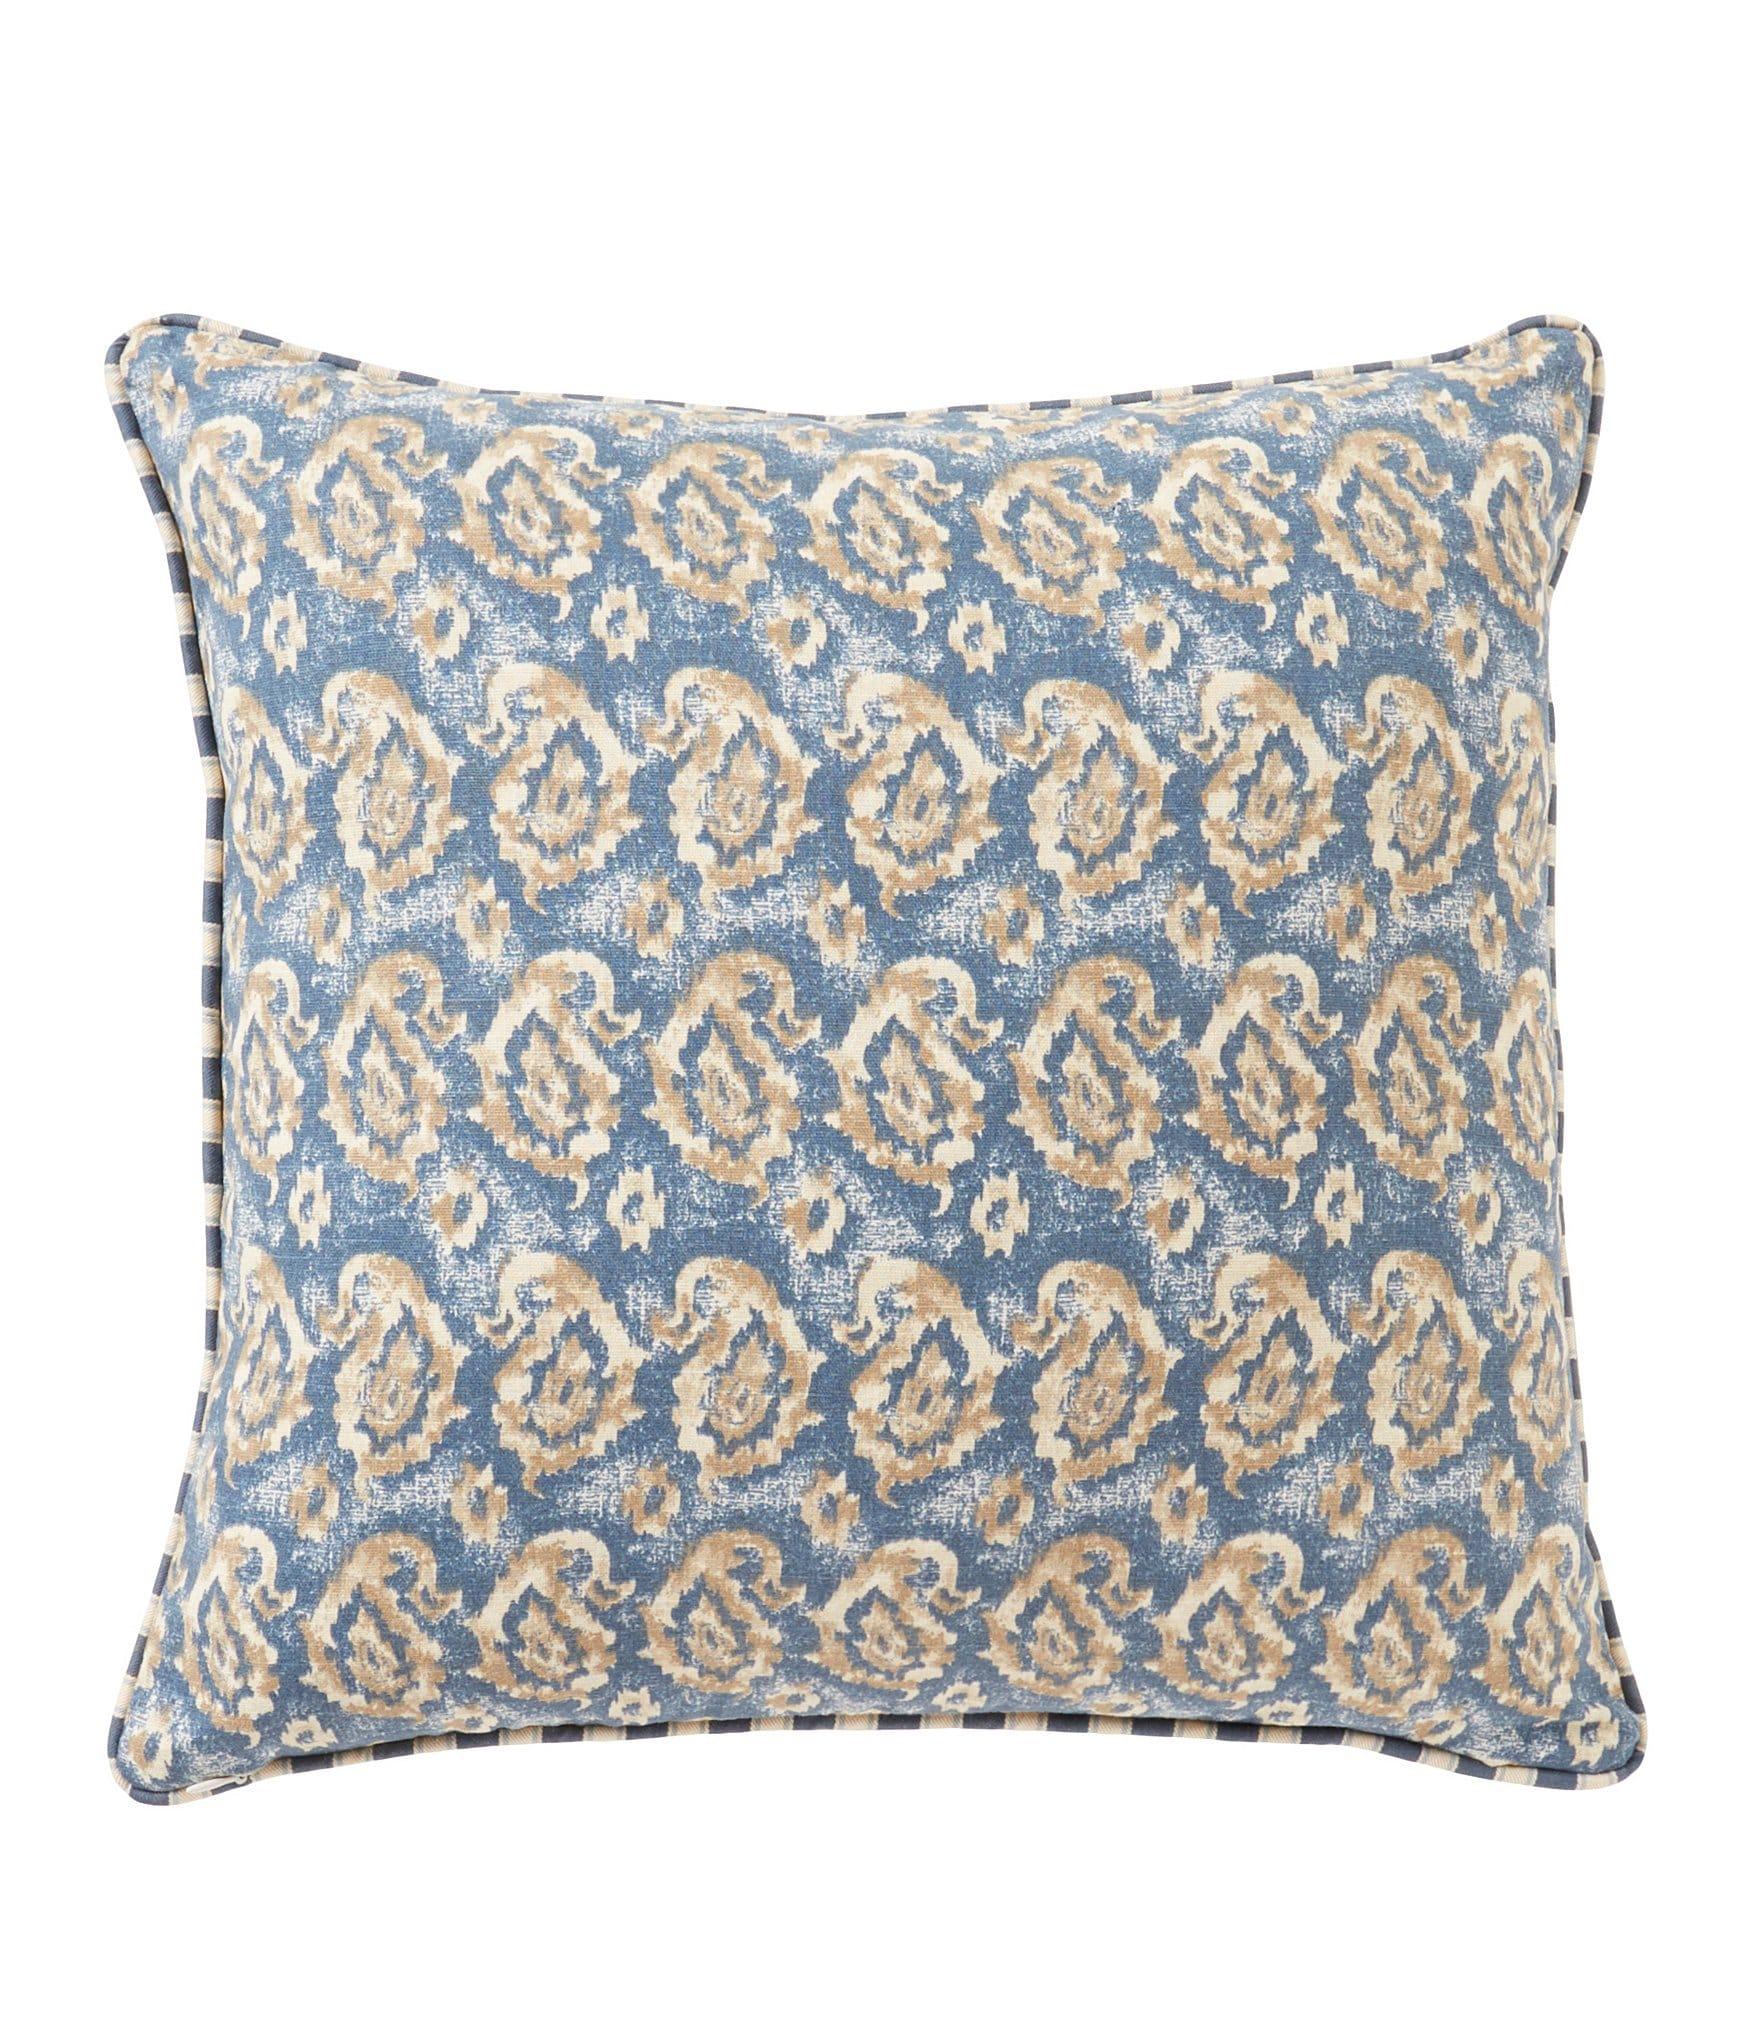 home  bedding  decorative pillows  dillardscom -